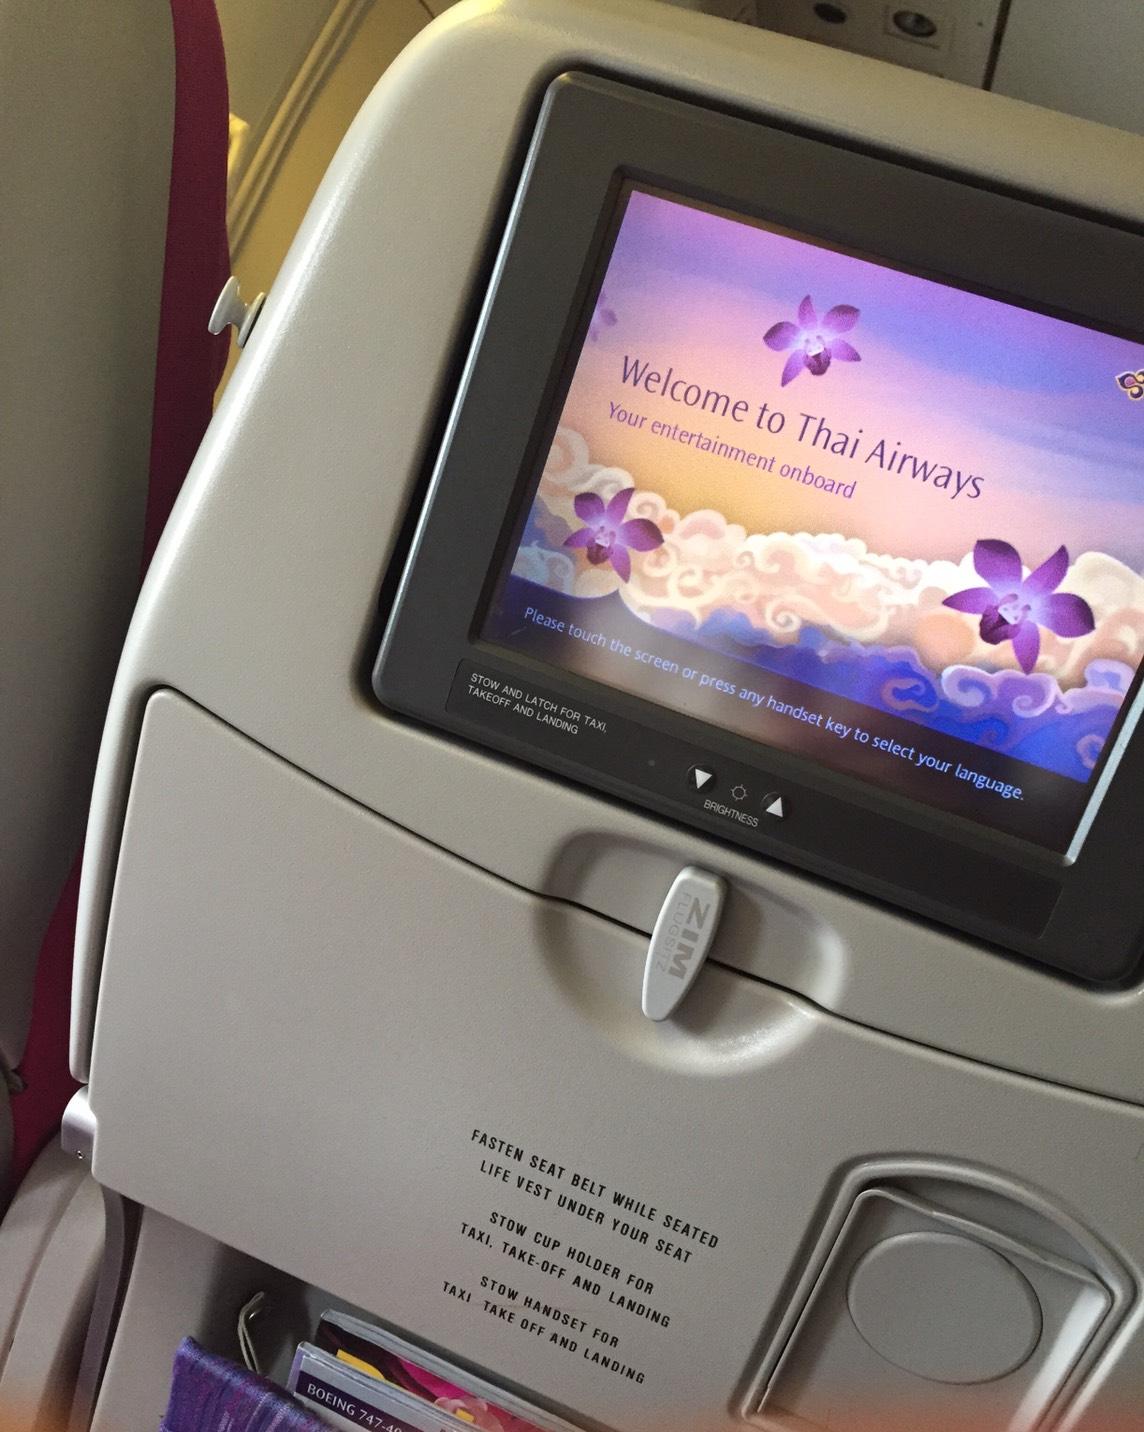 Thai Airways。旅は空から始まる